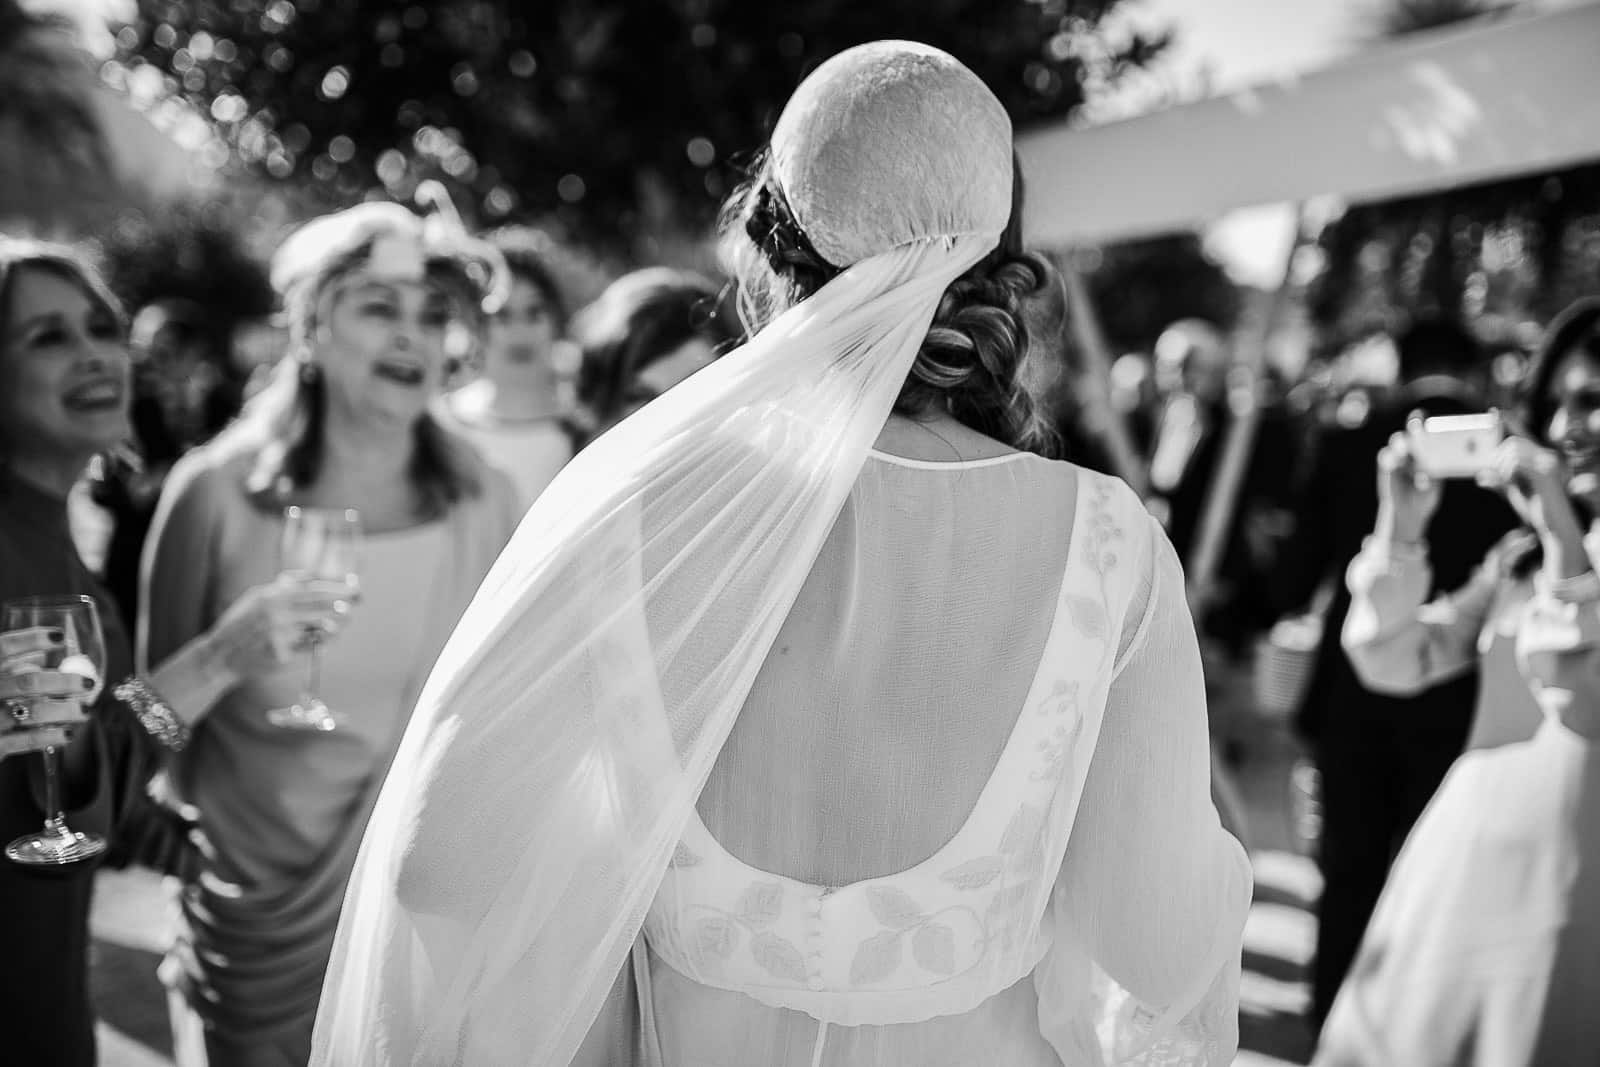 detalles novia vestido velo blanco